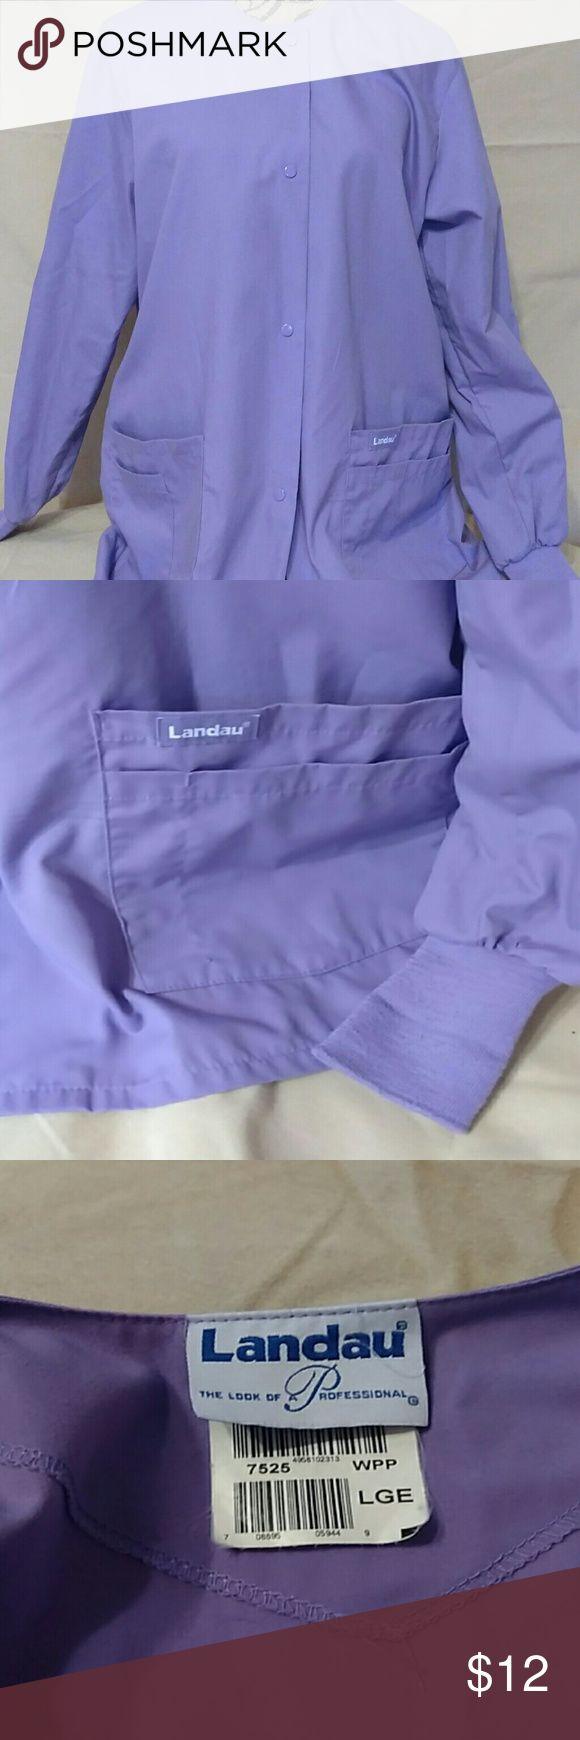 Landau Scrub Jacket Purple jacket with several pockets. Landau Jackets & Coats Utility Jackets